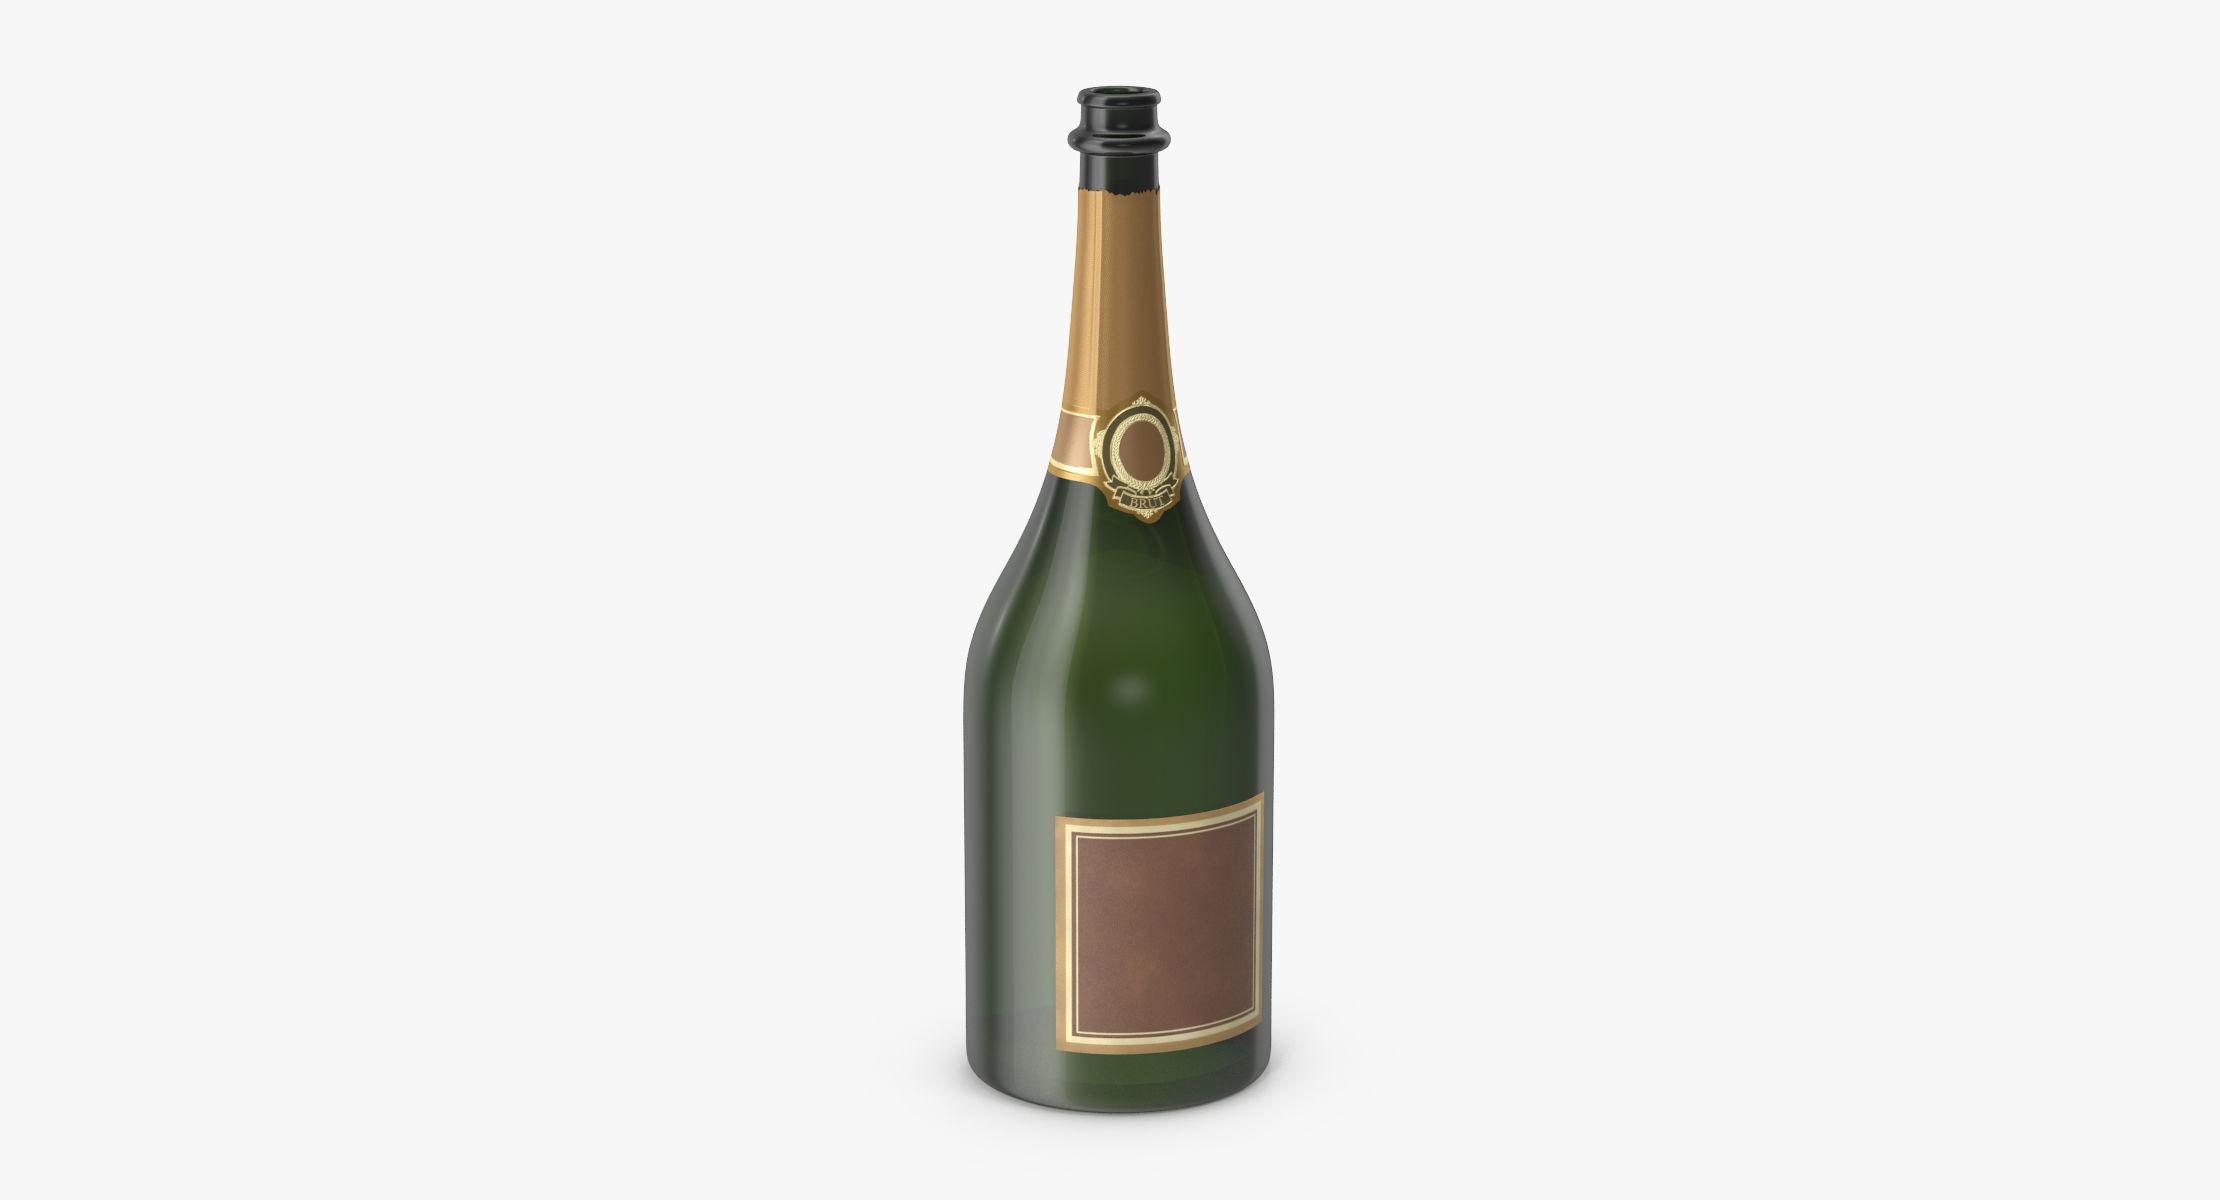 Champagne Bottle 02 Opened - reel 1